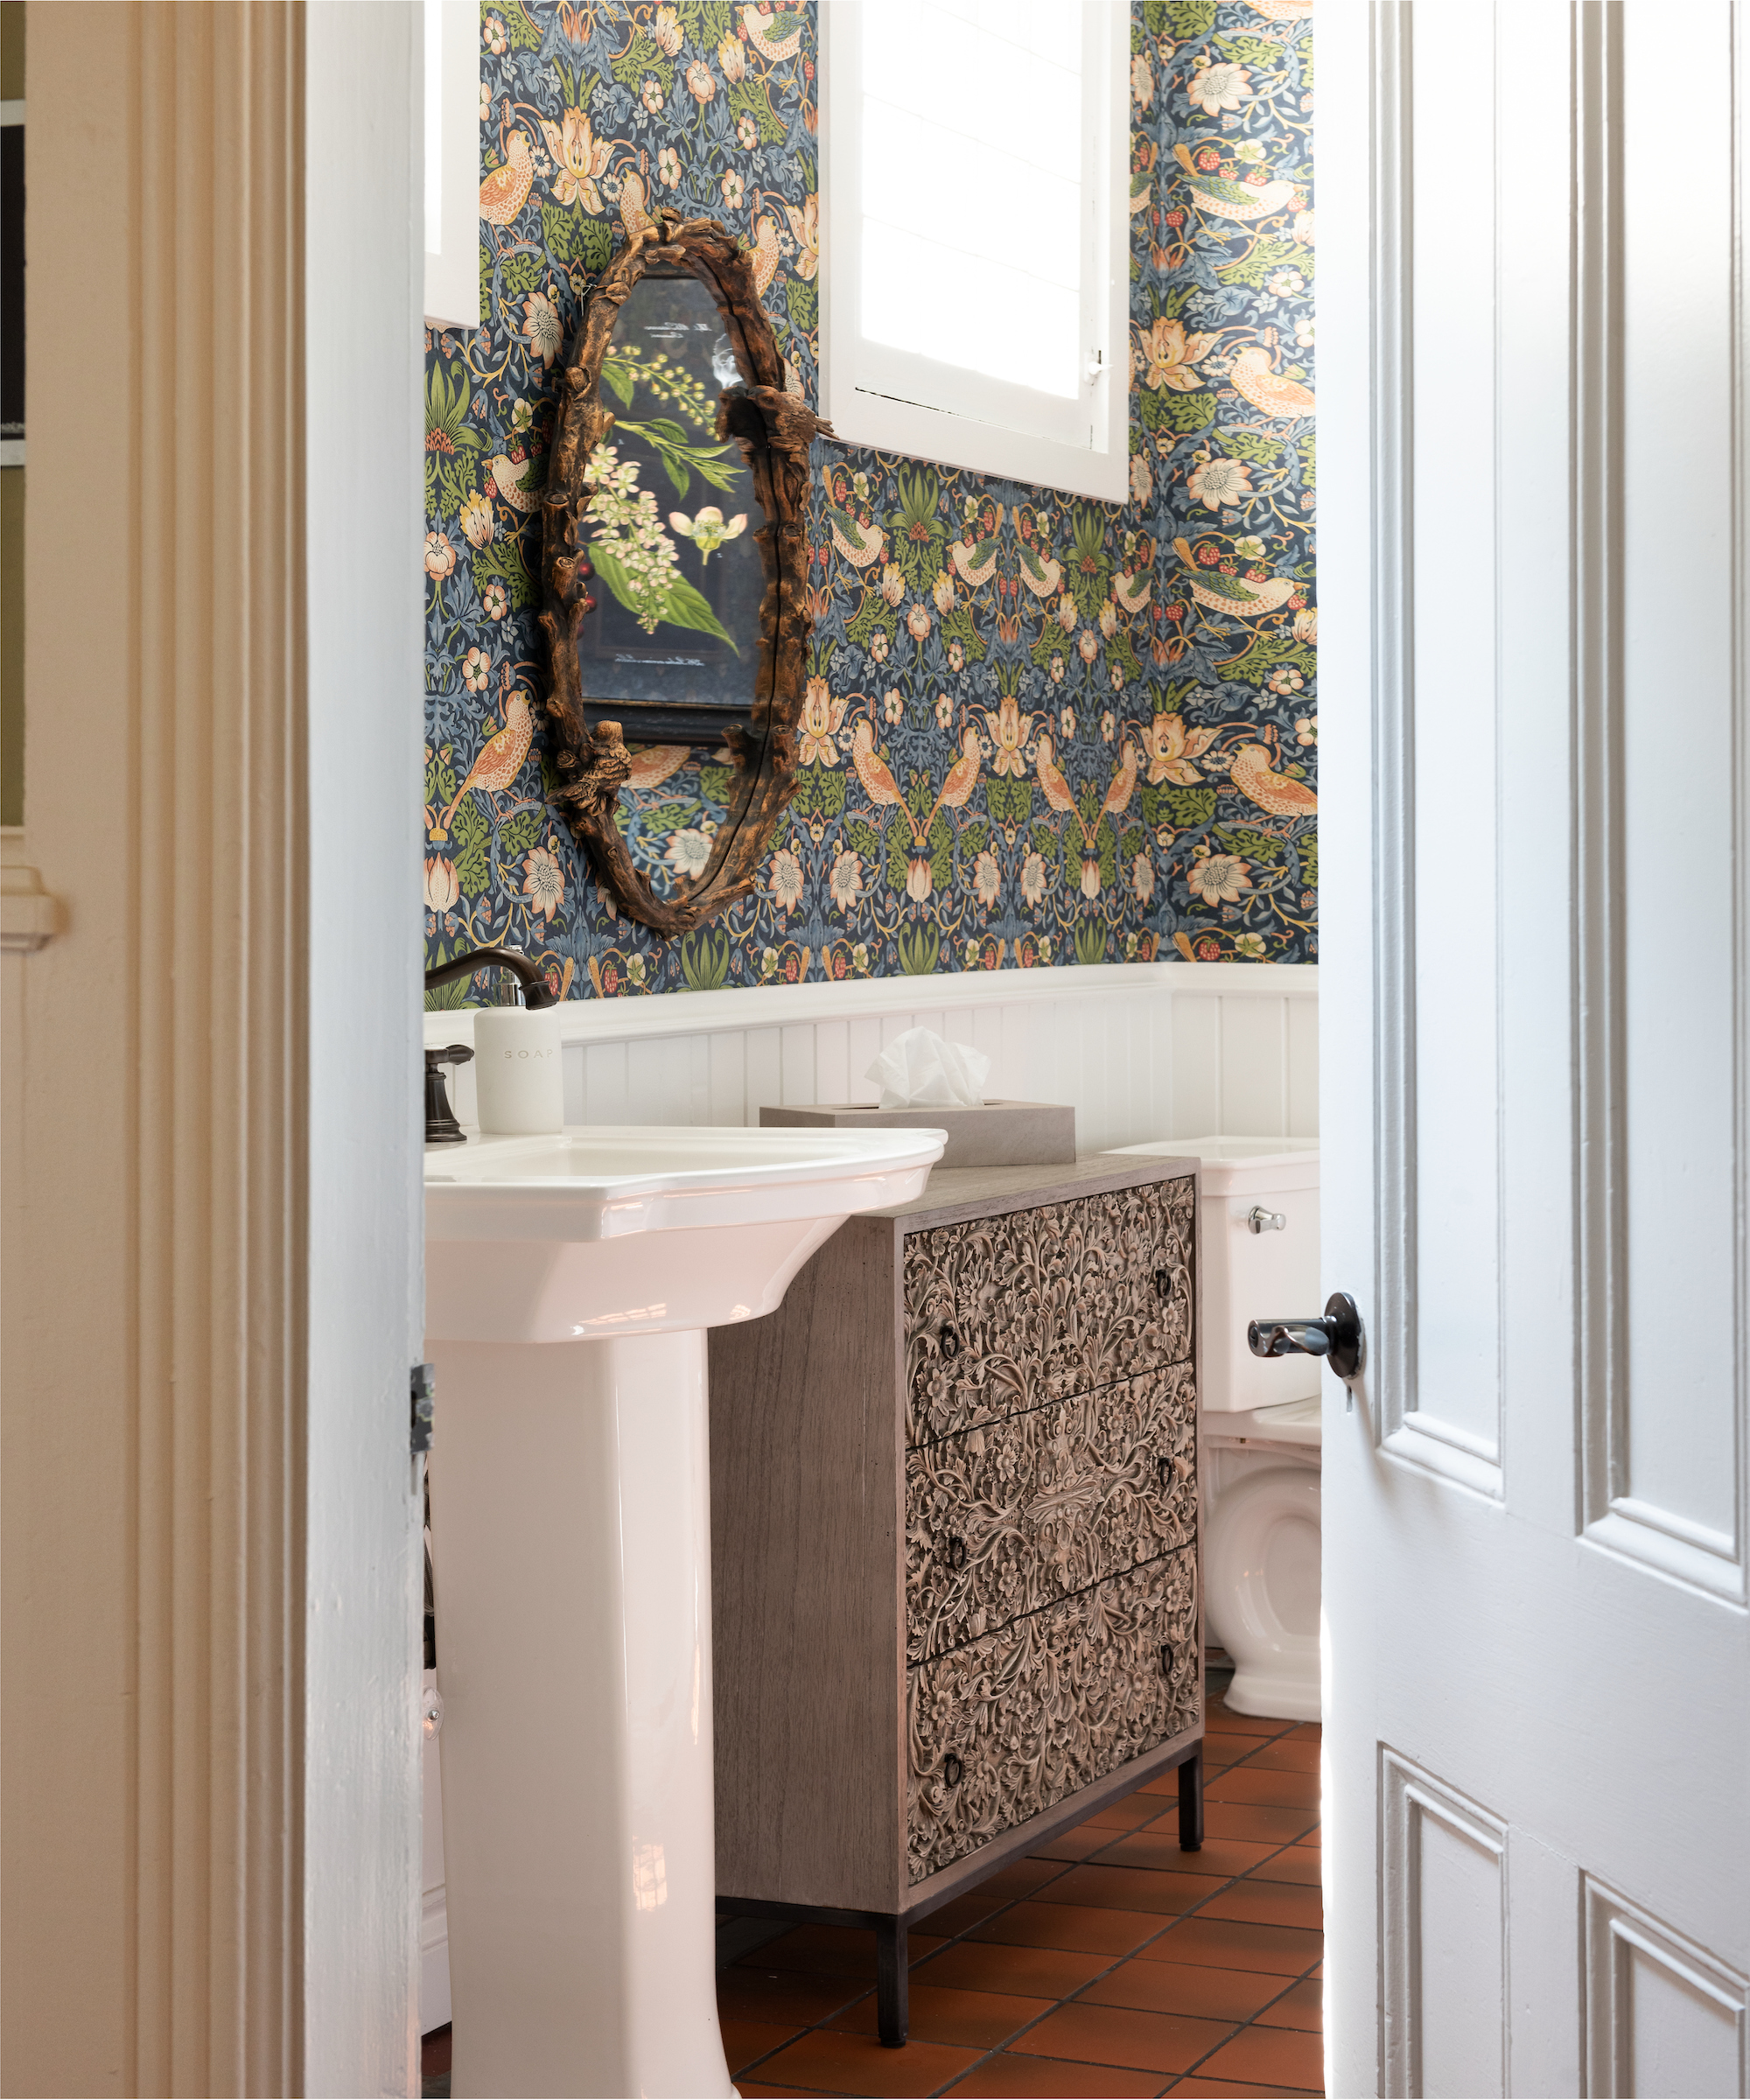 Huntingdon_washroom-104.jpg